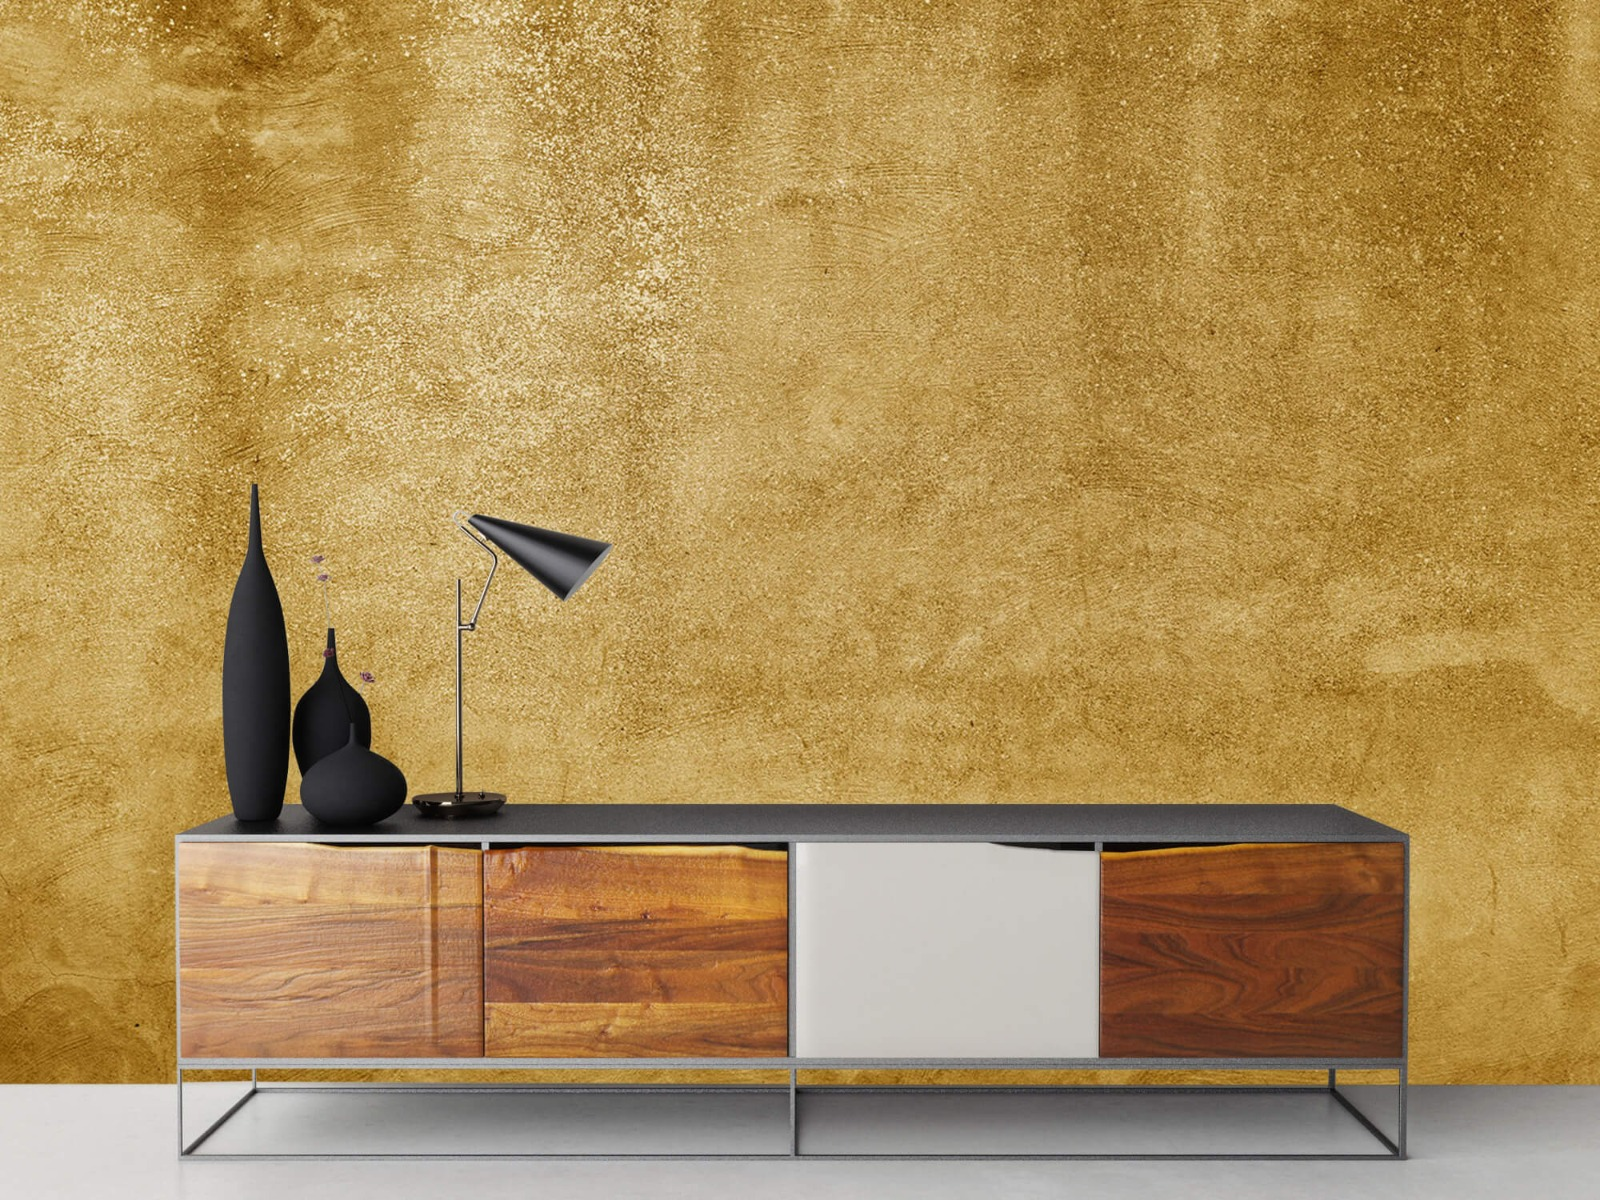 Betonlook behang - Oker geel beton - Woonkamer 16